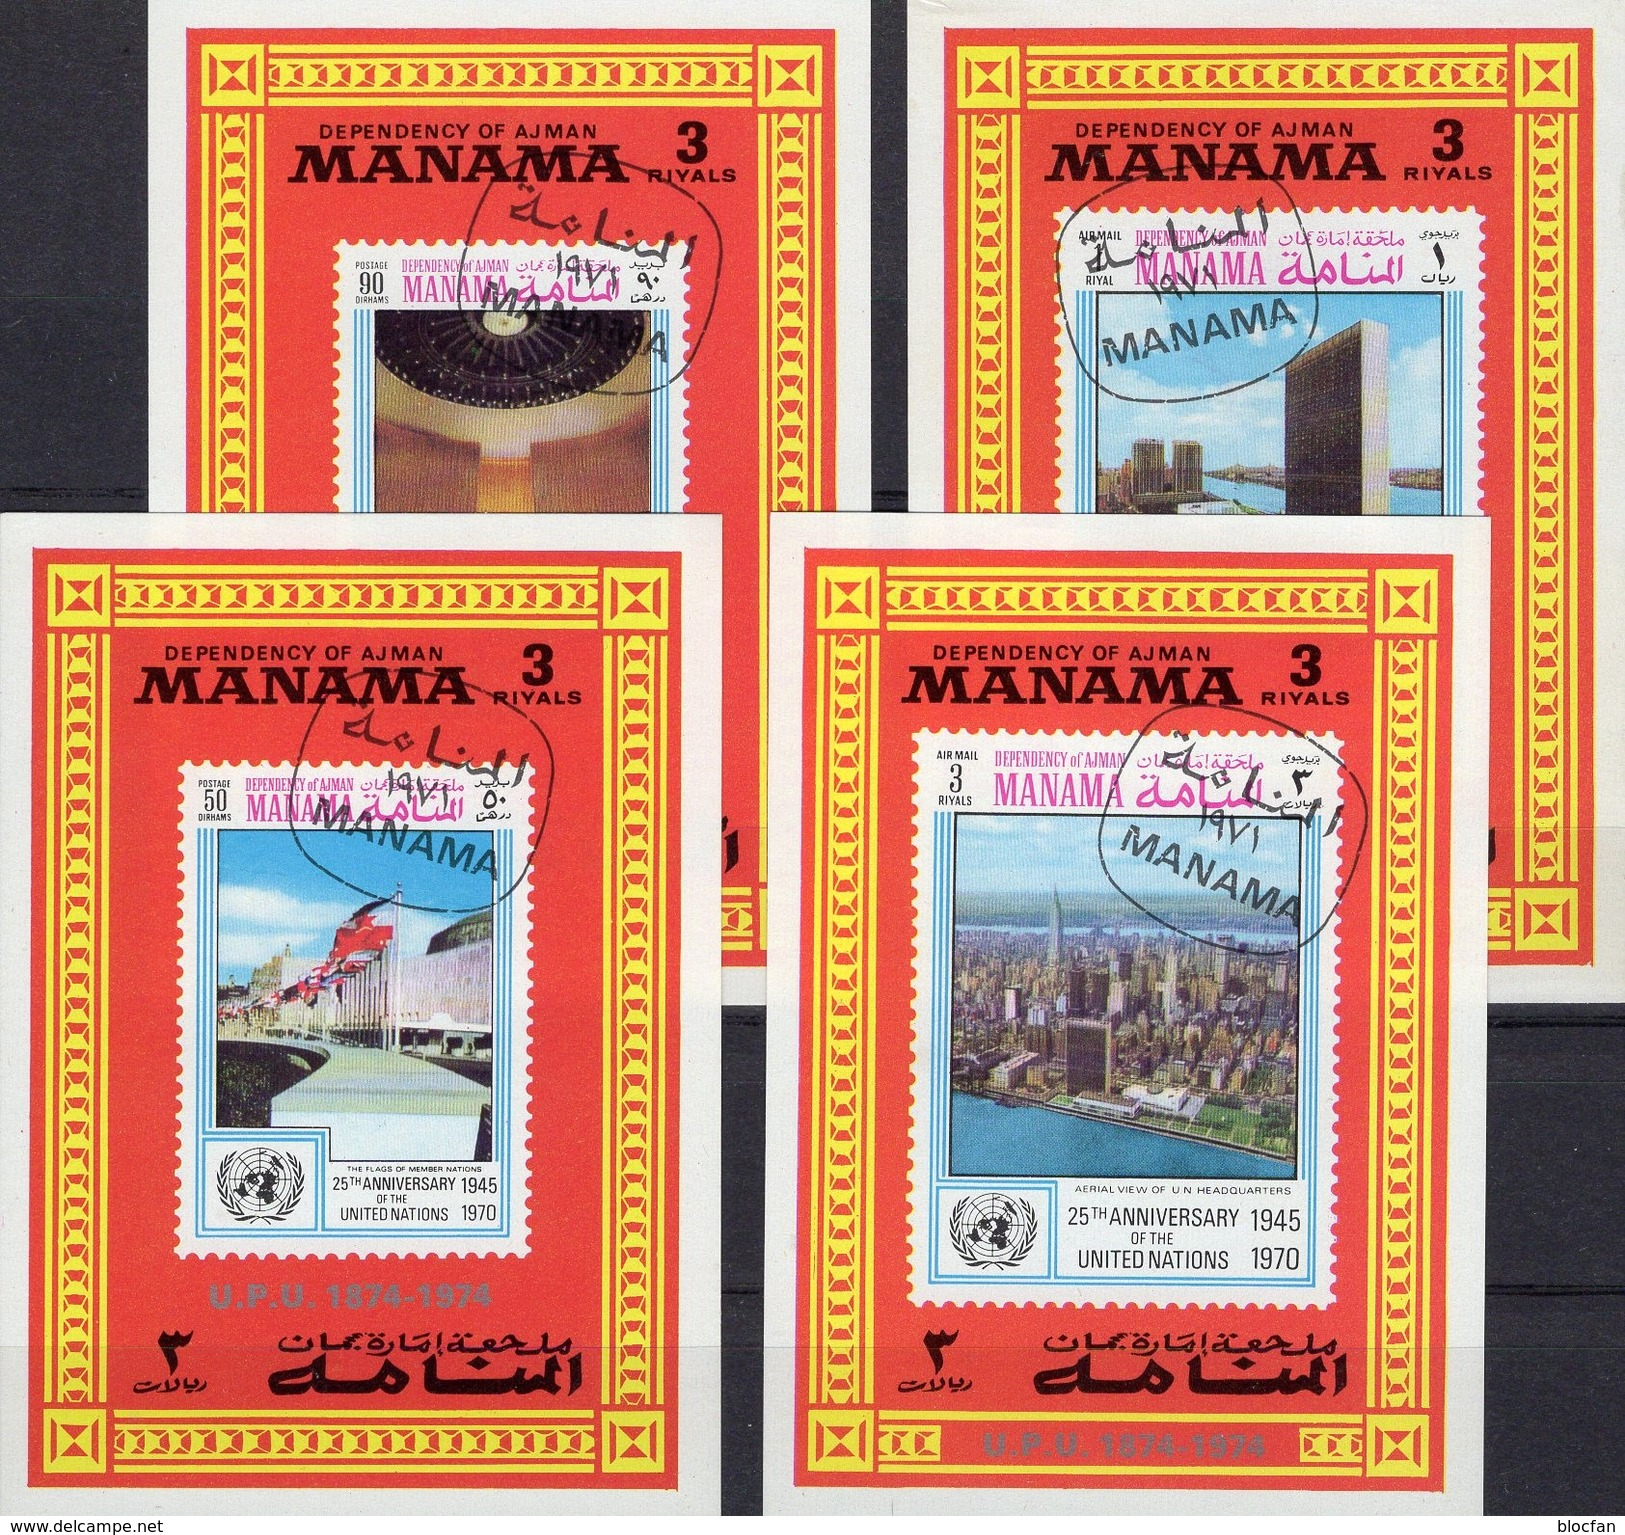 Flaggen UN New York 1971 Ajman/Manama Block A-D107 O 16€ 25 Jahre UNO Hojita Ss Blocs Flag Sheets Ms Bf Architectur - Stamps